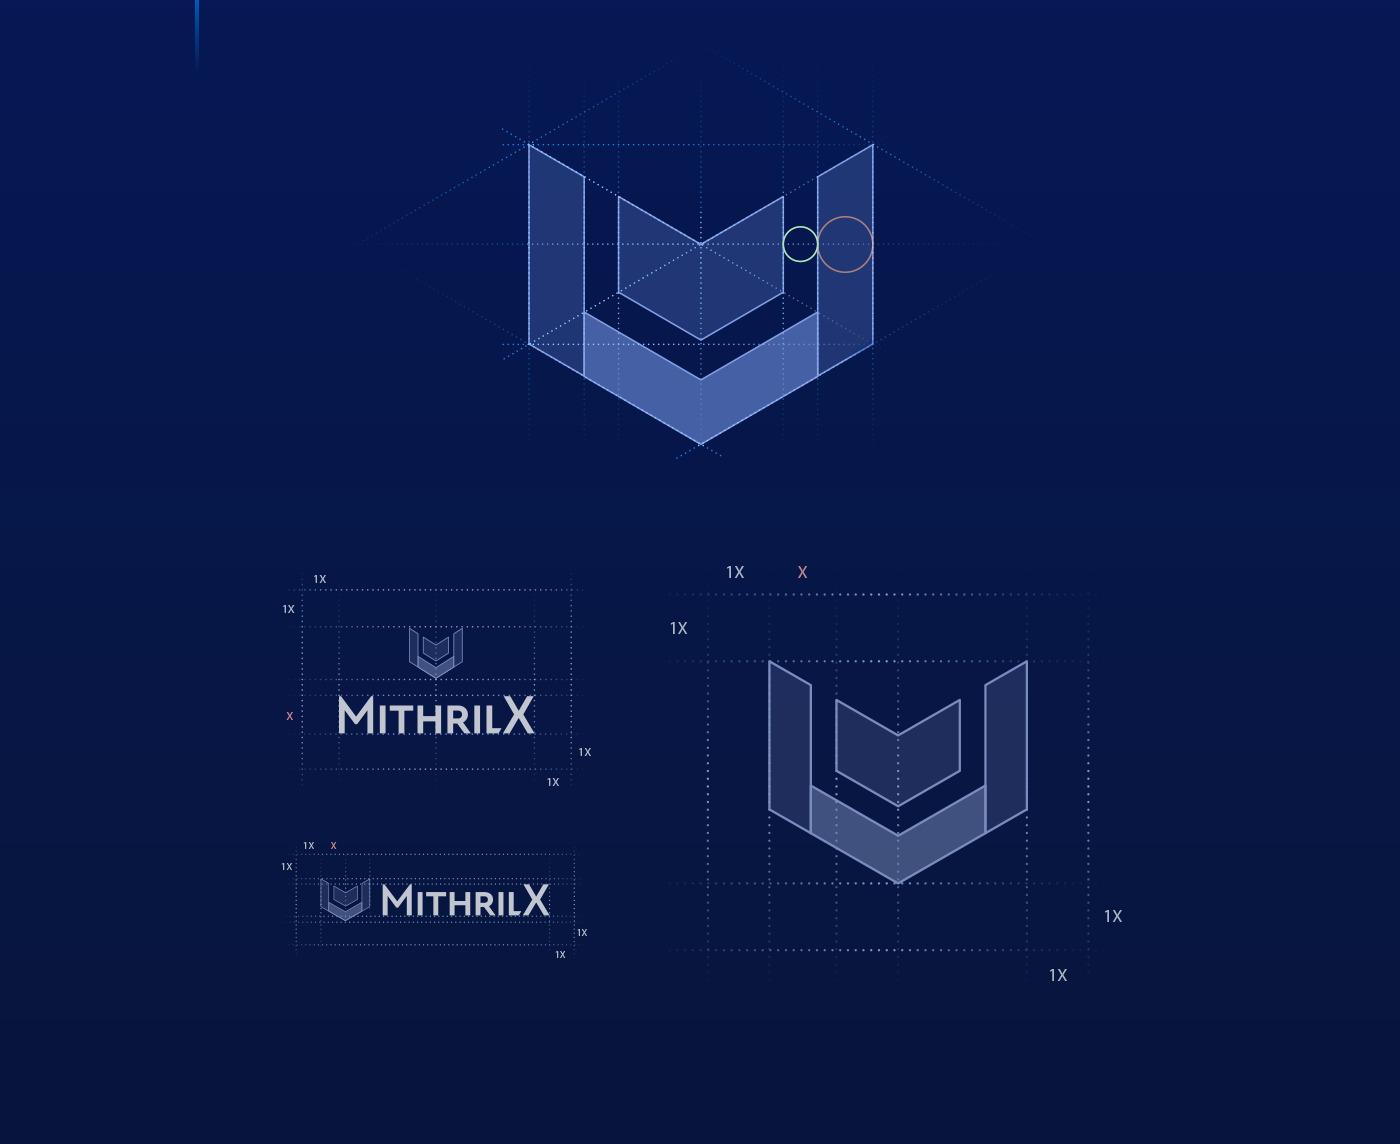 mithril x logo construction